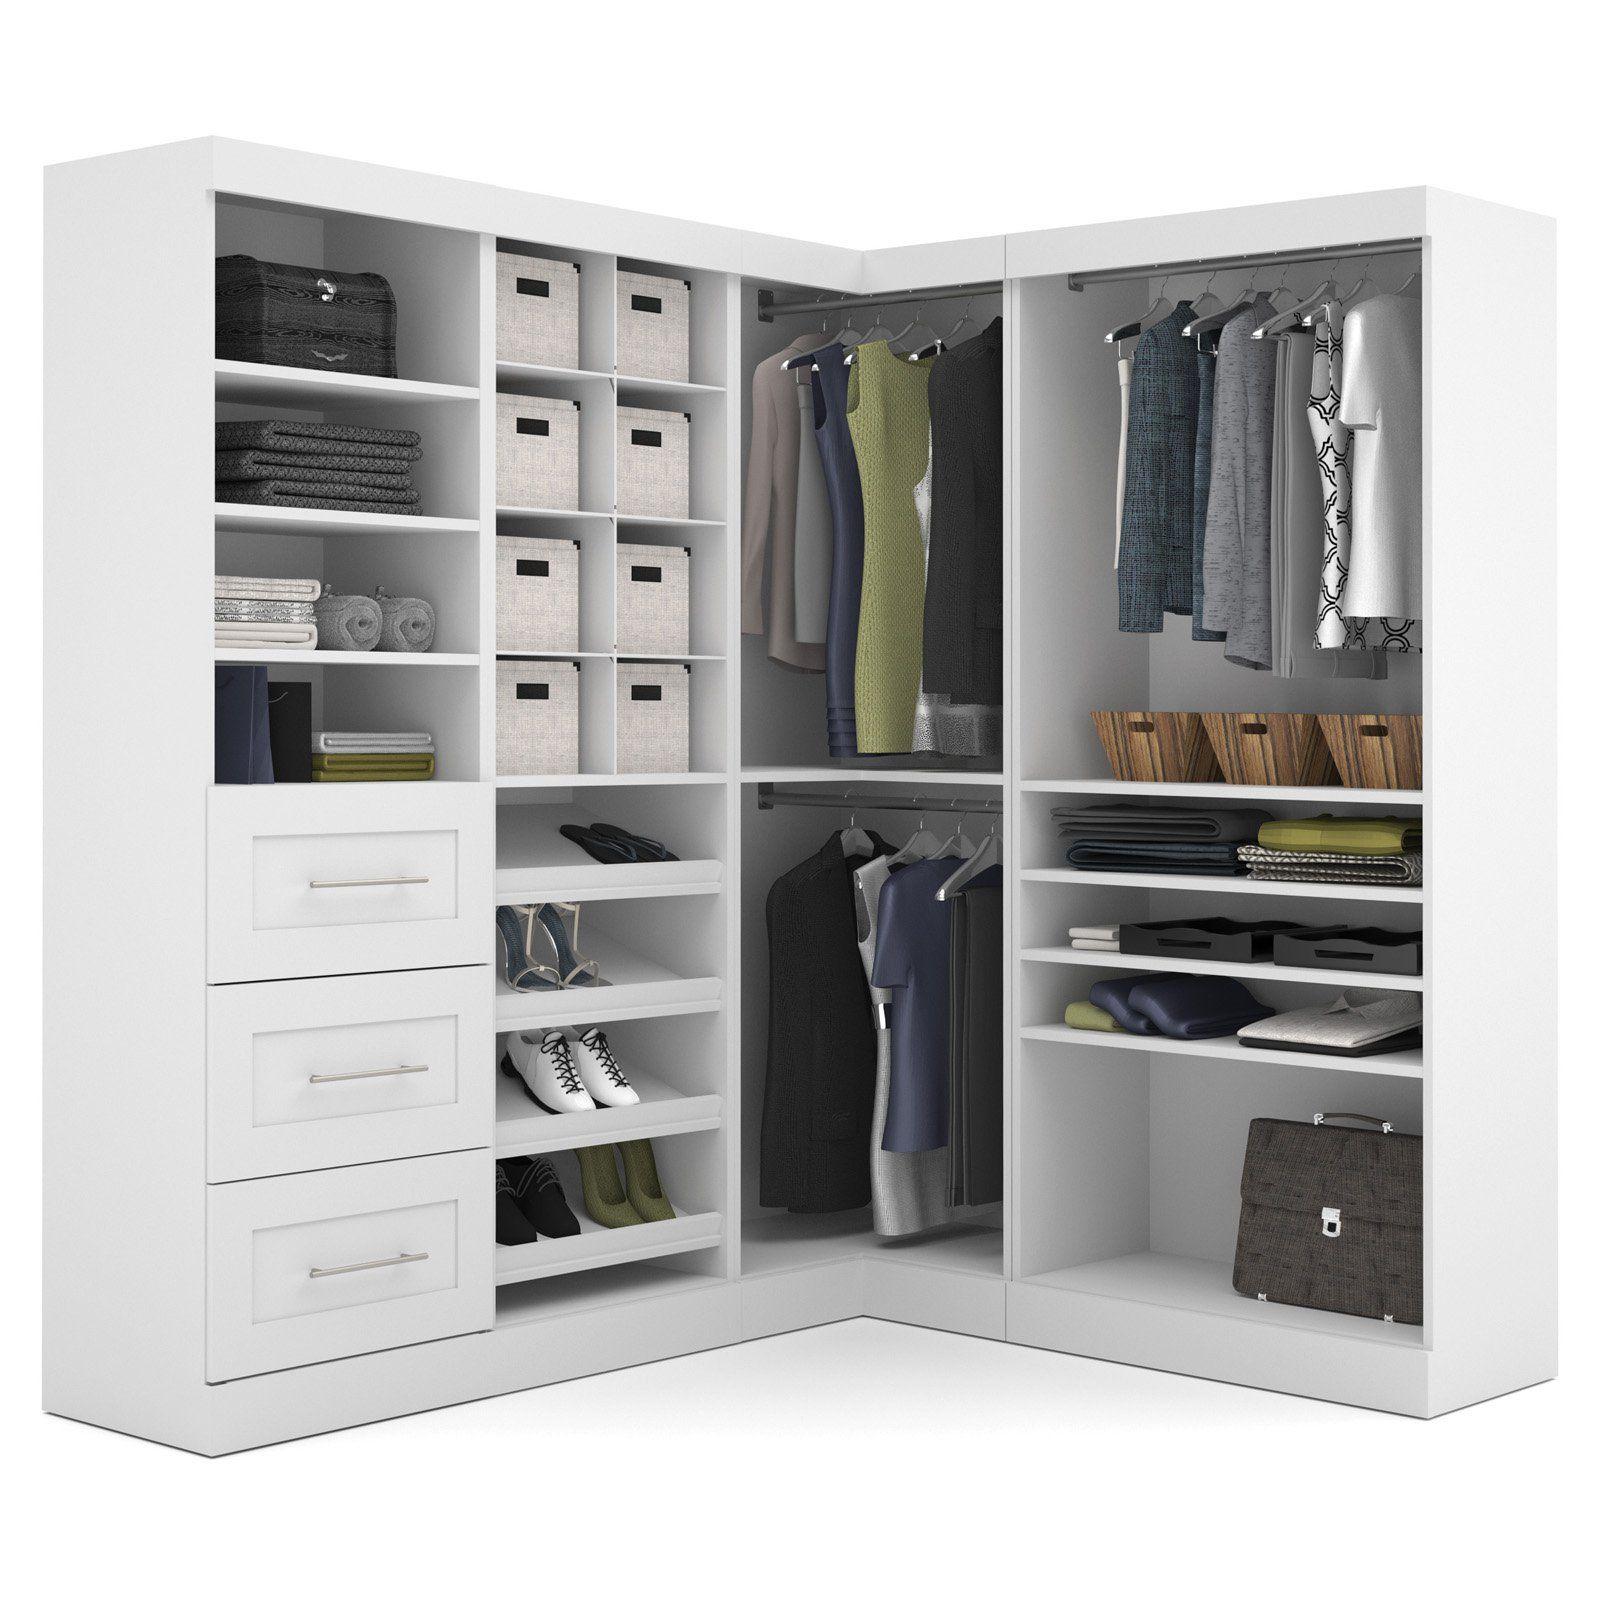 Pur By Bestar 26854 82 In Corner Storage Kit Closet System Closet Organizing Systems Closet Bedroom